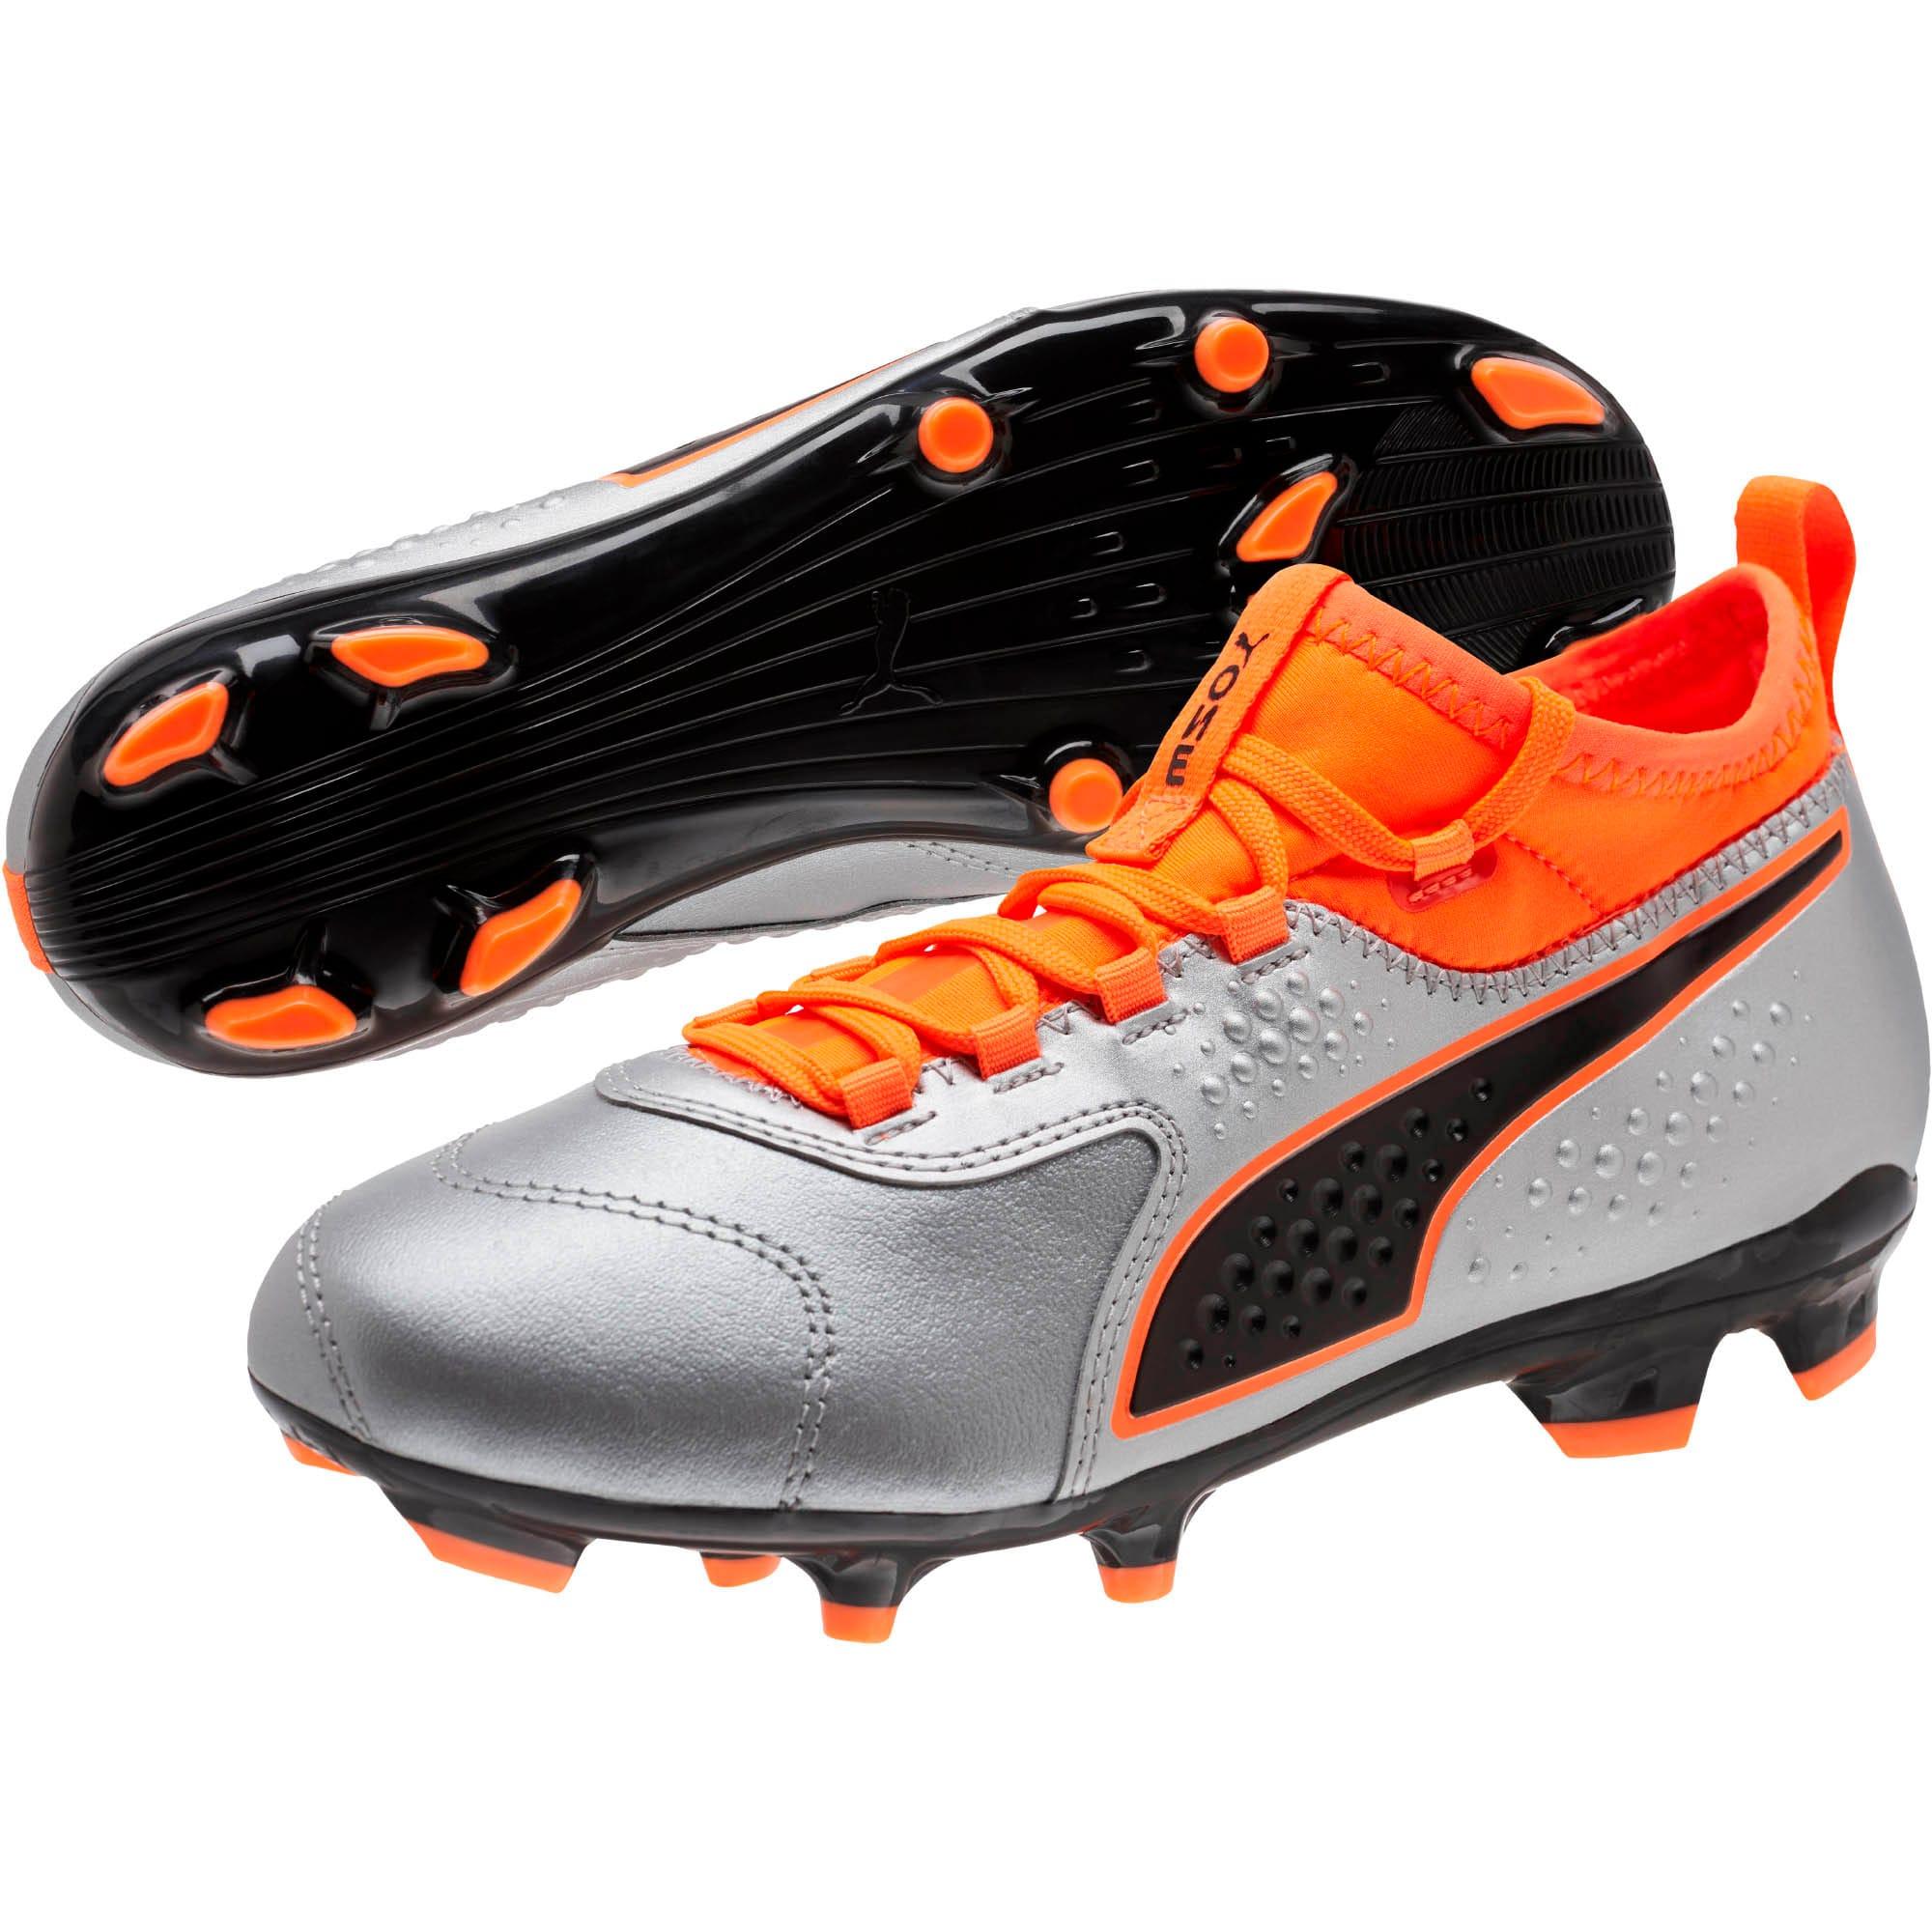 Thumbnail 2 of PUMA ONE 3 FG Soccer Cleats JR, Silver-Orange-Black, medium